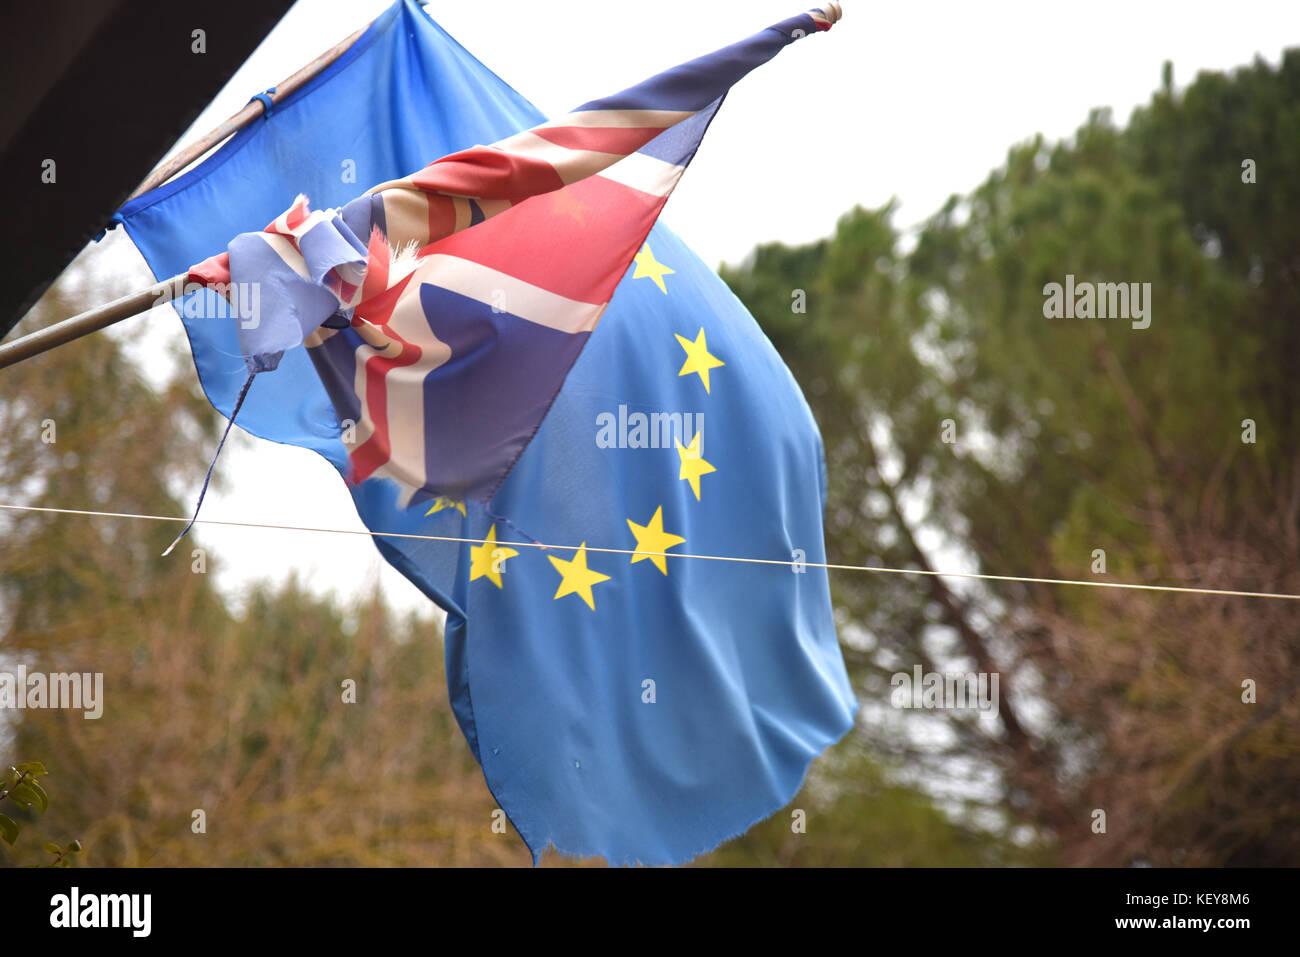 union jack and EU European flags tangled up - Stock Image